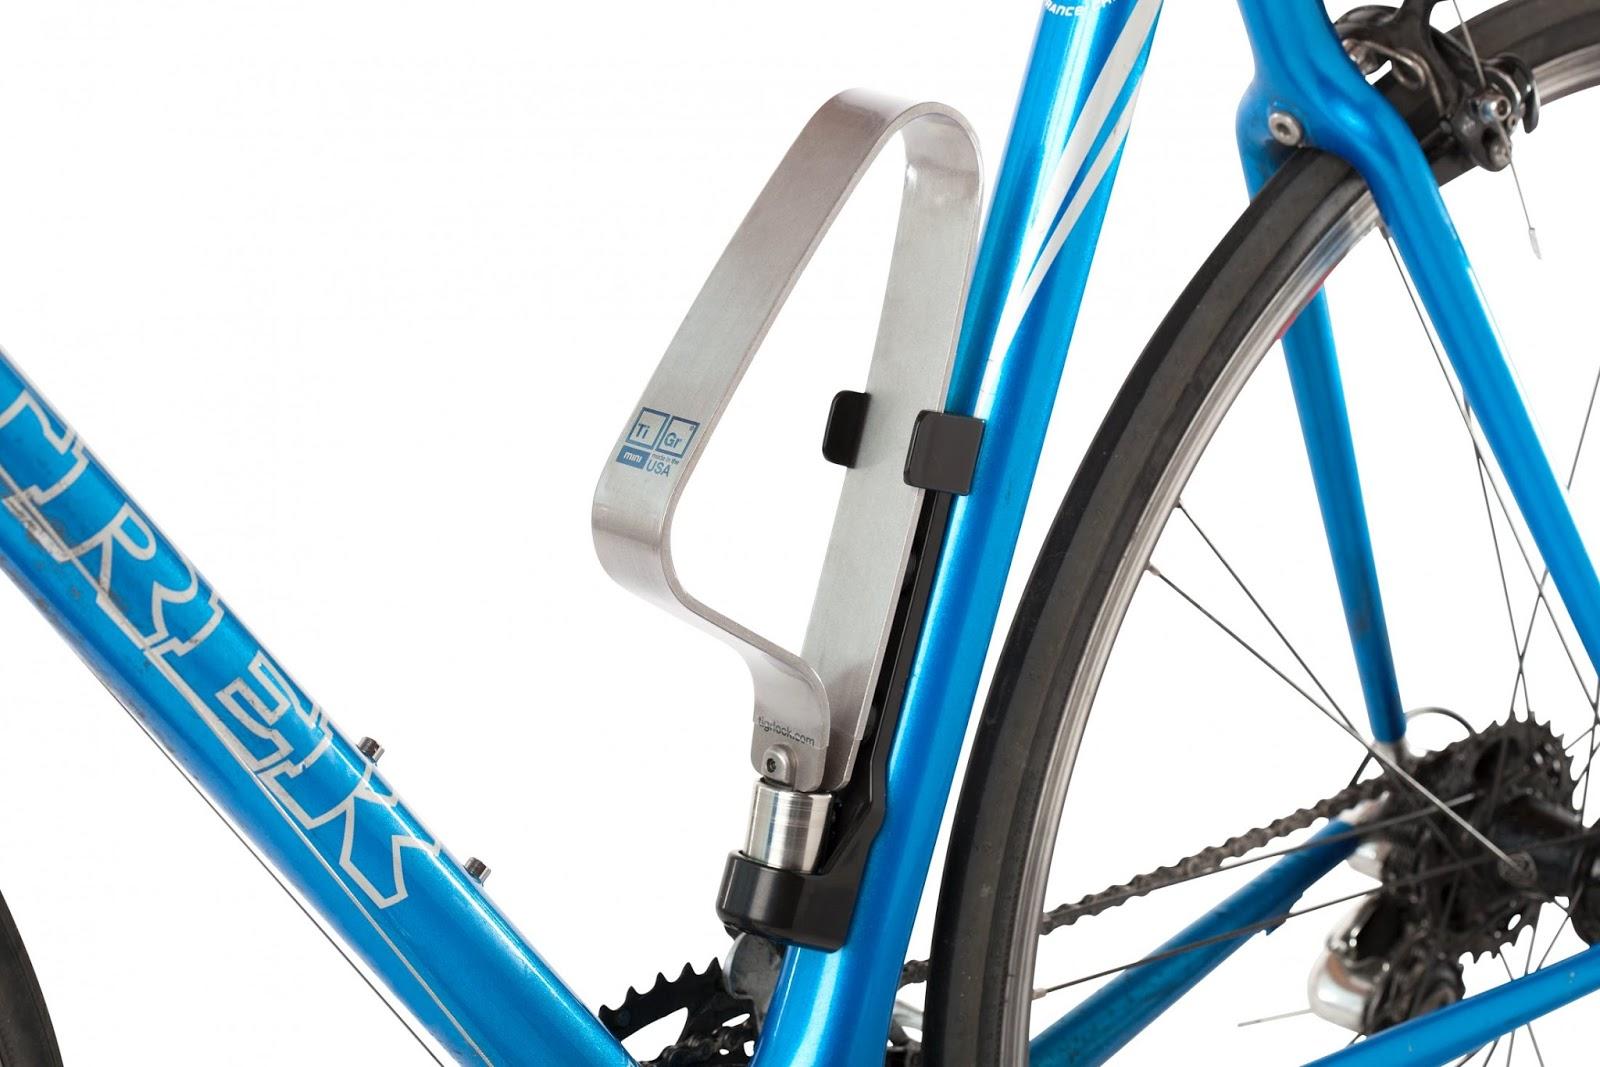 Kent's Bike Blog: Review: TiGr mini Bike Lock